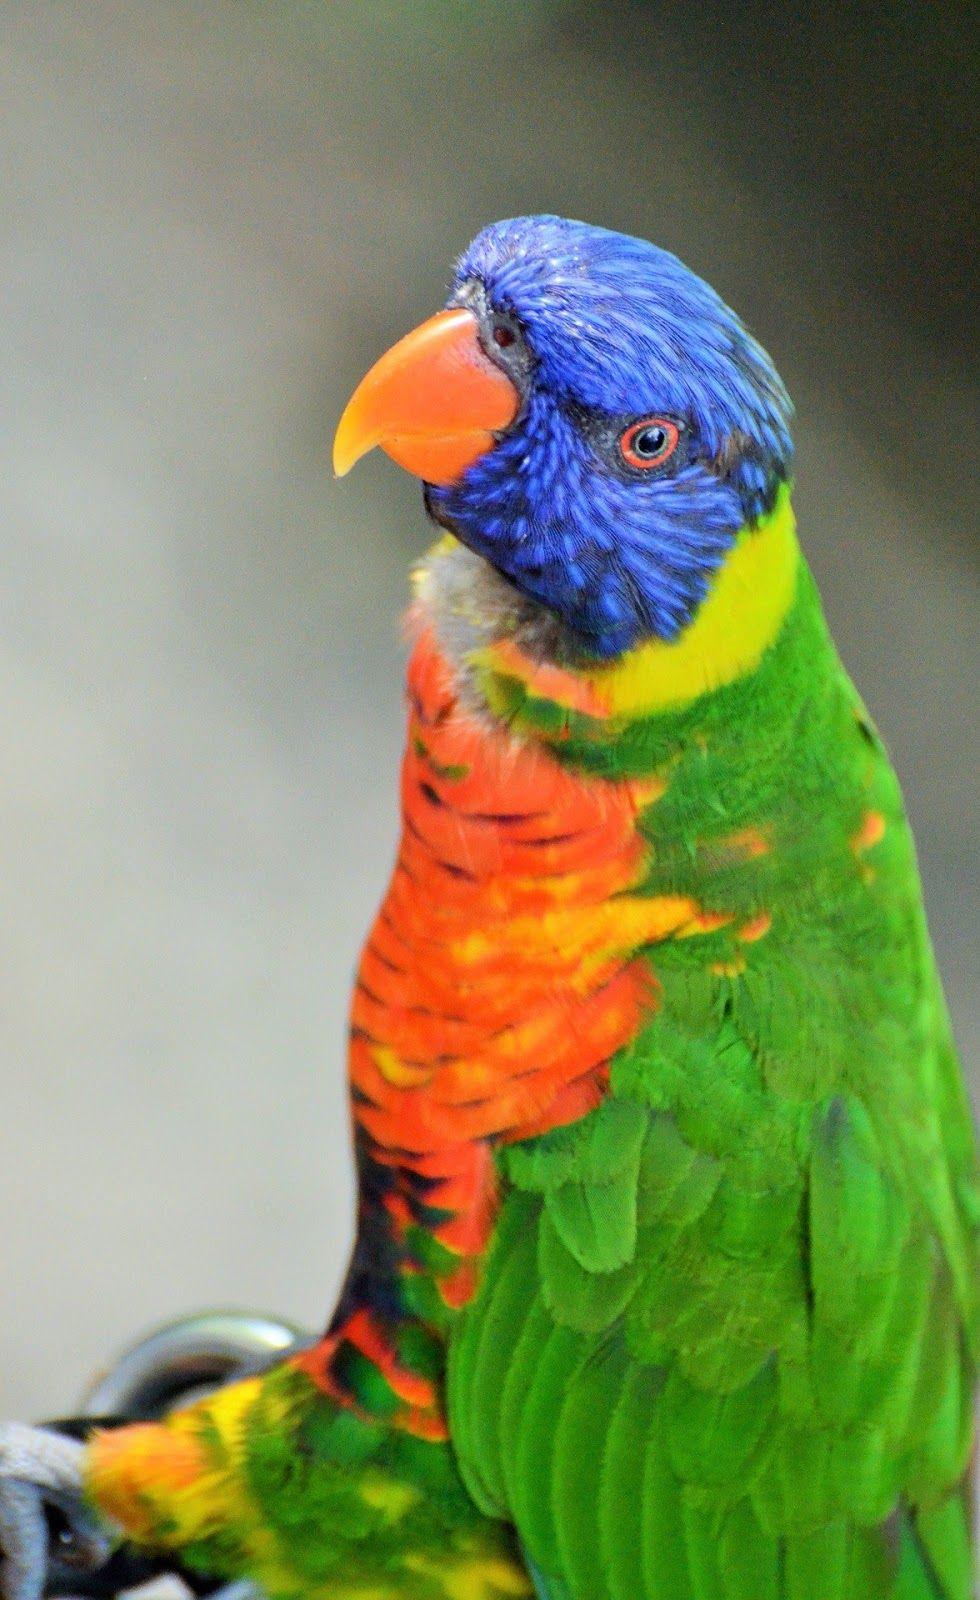 Owl Parrot is a wonderful bird